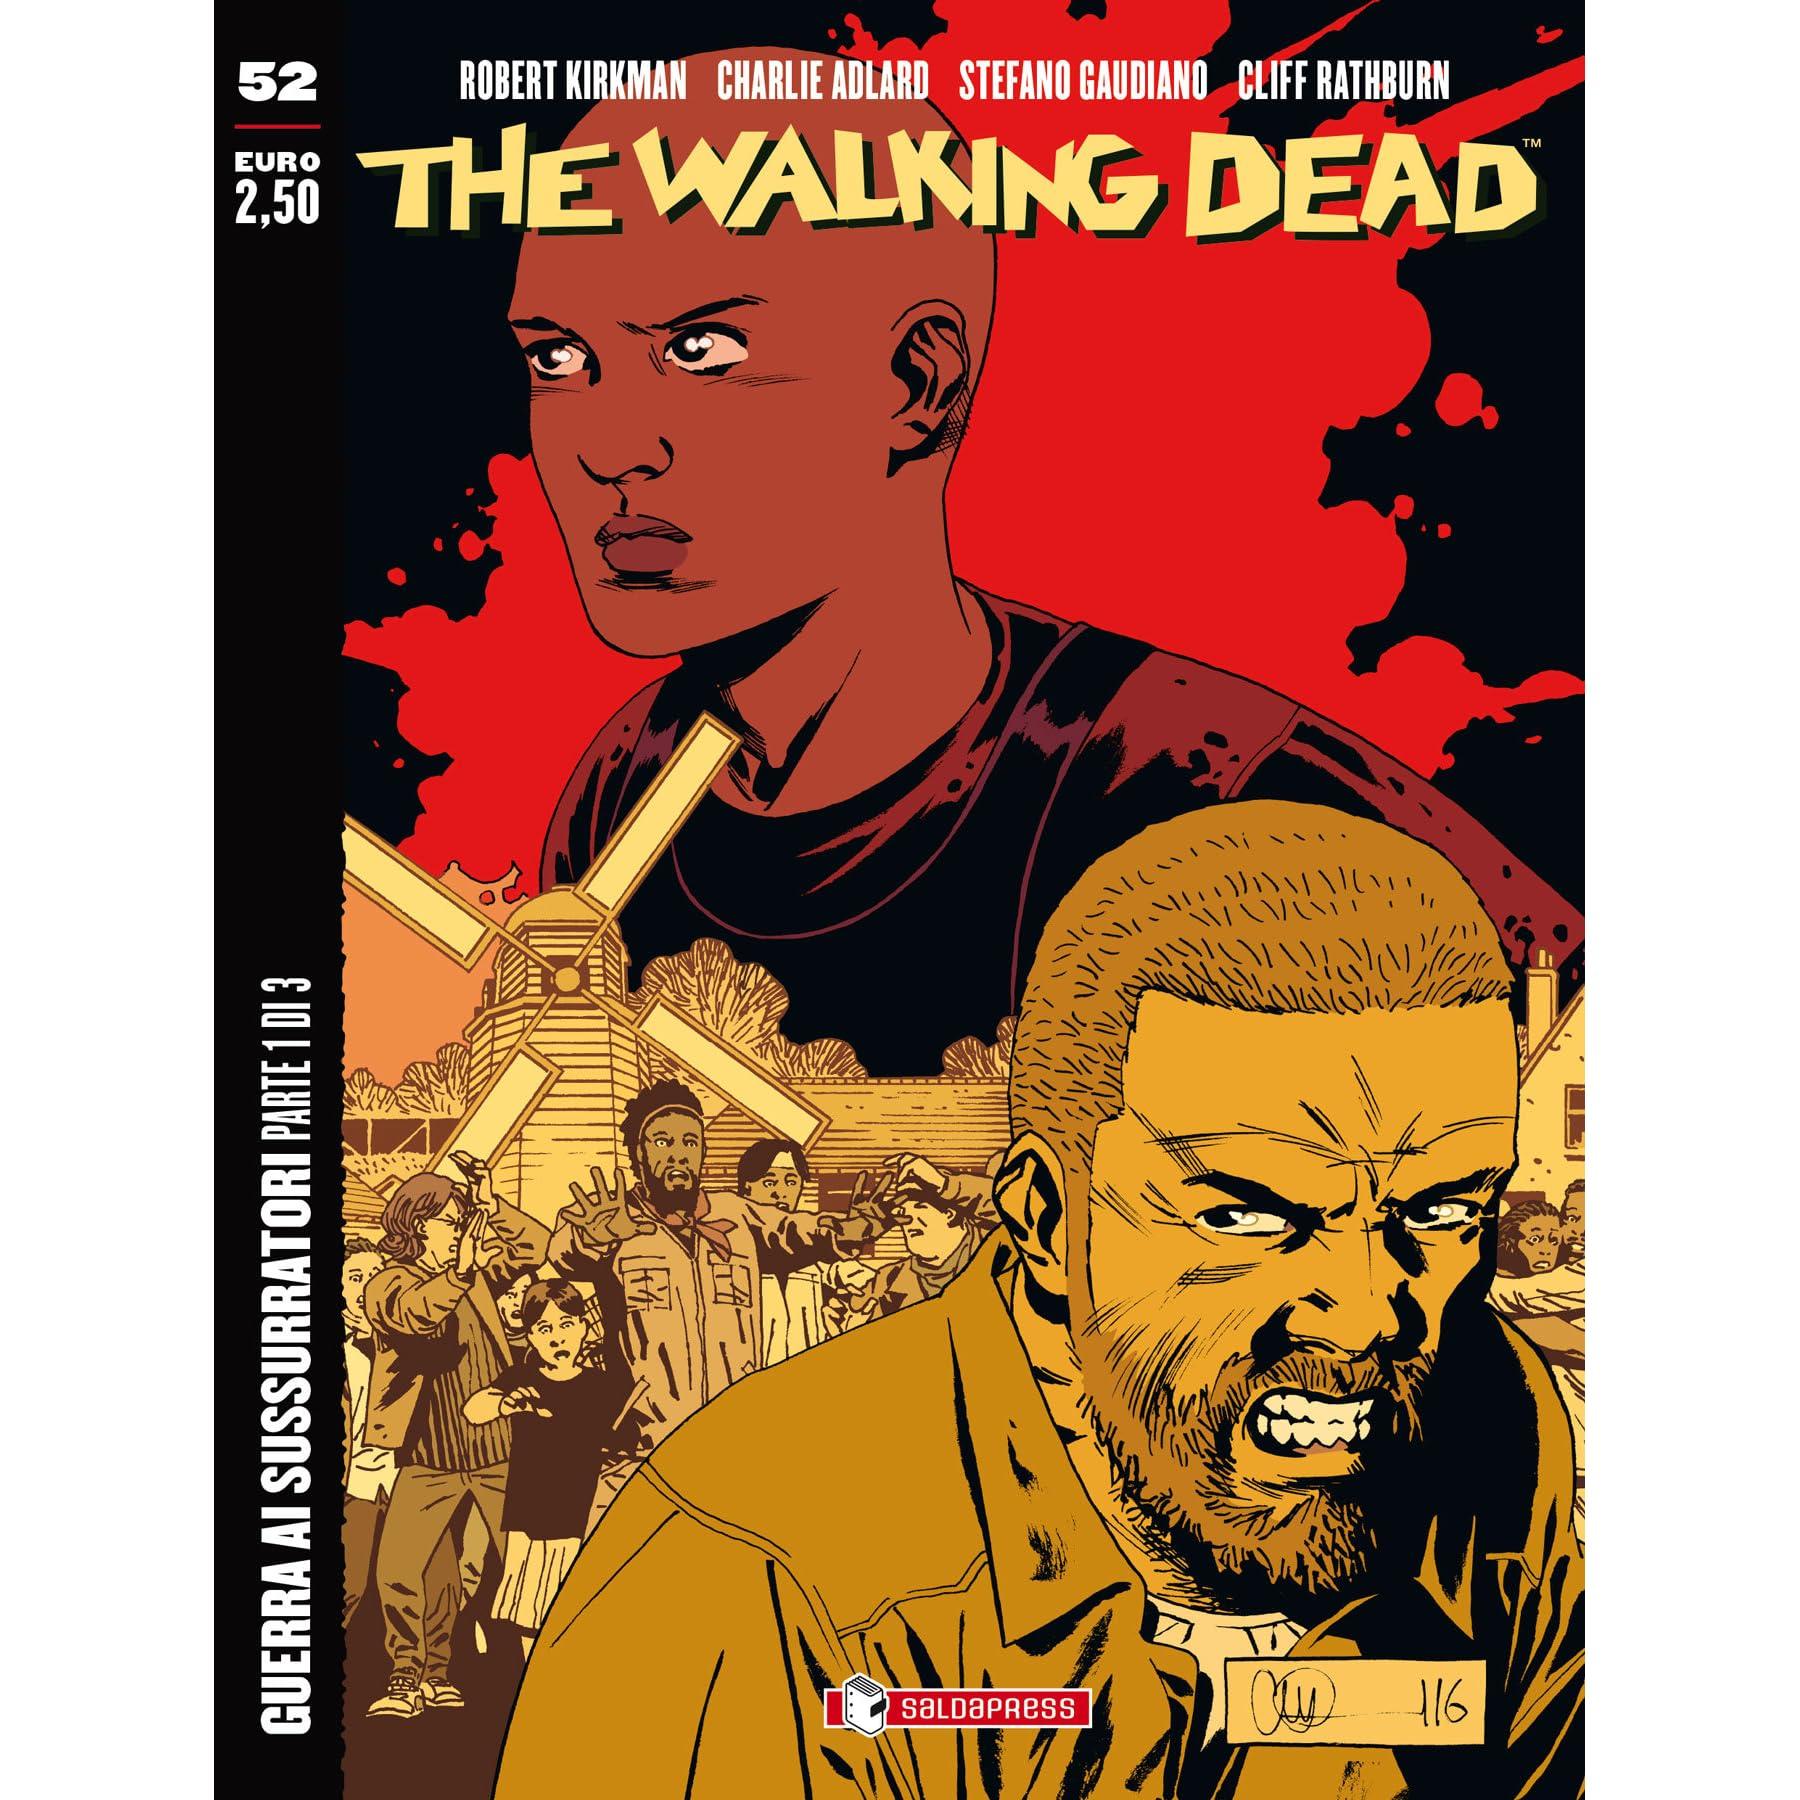 Joanne Harvelle | The Walking Dead Chapter 1: Days Gone